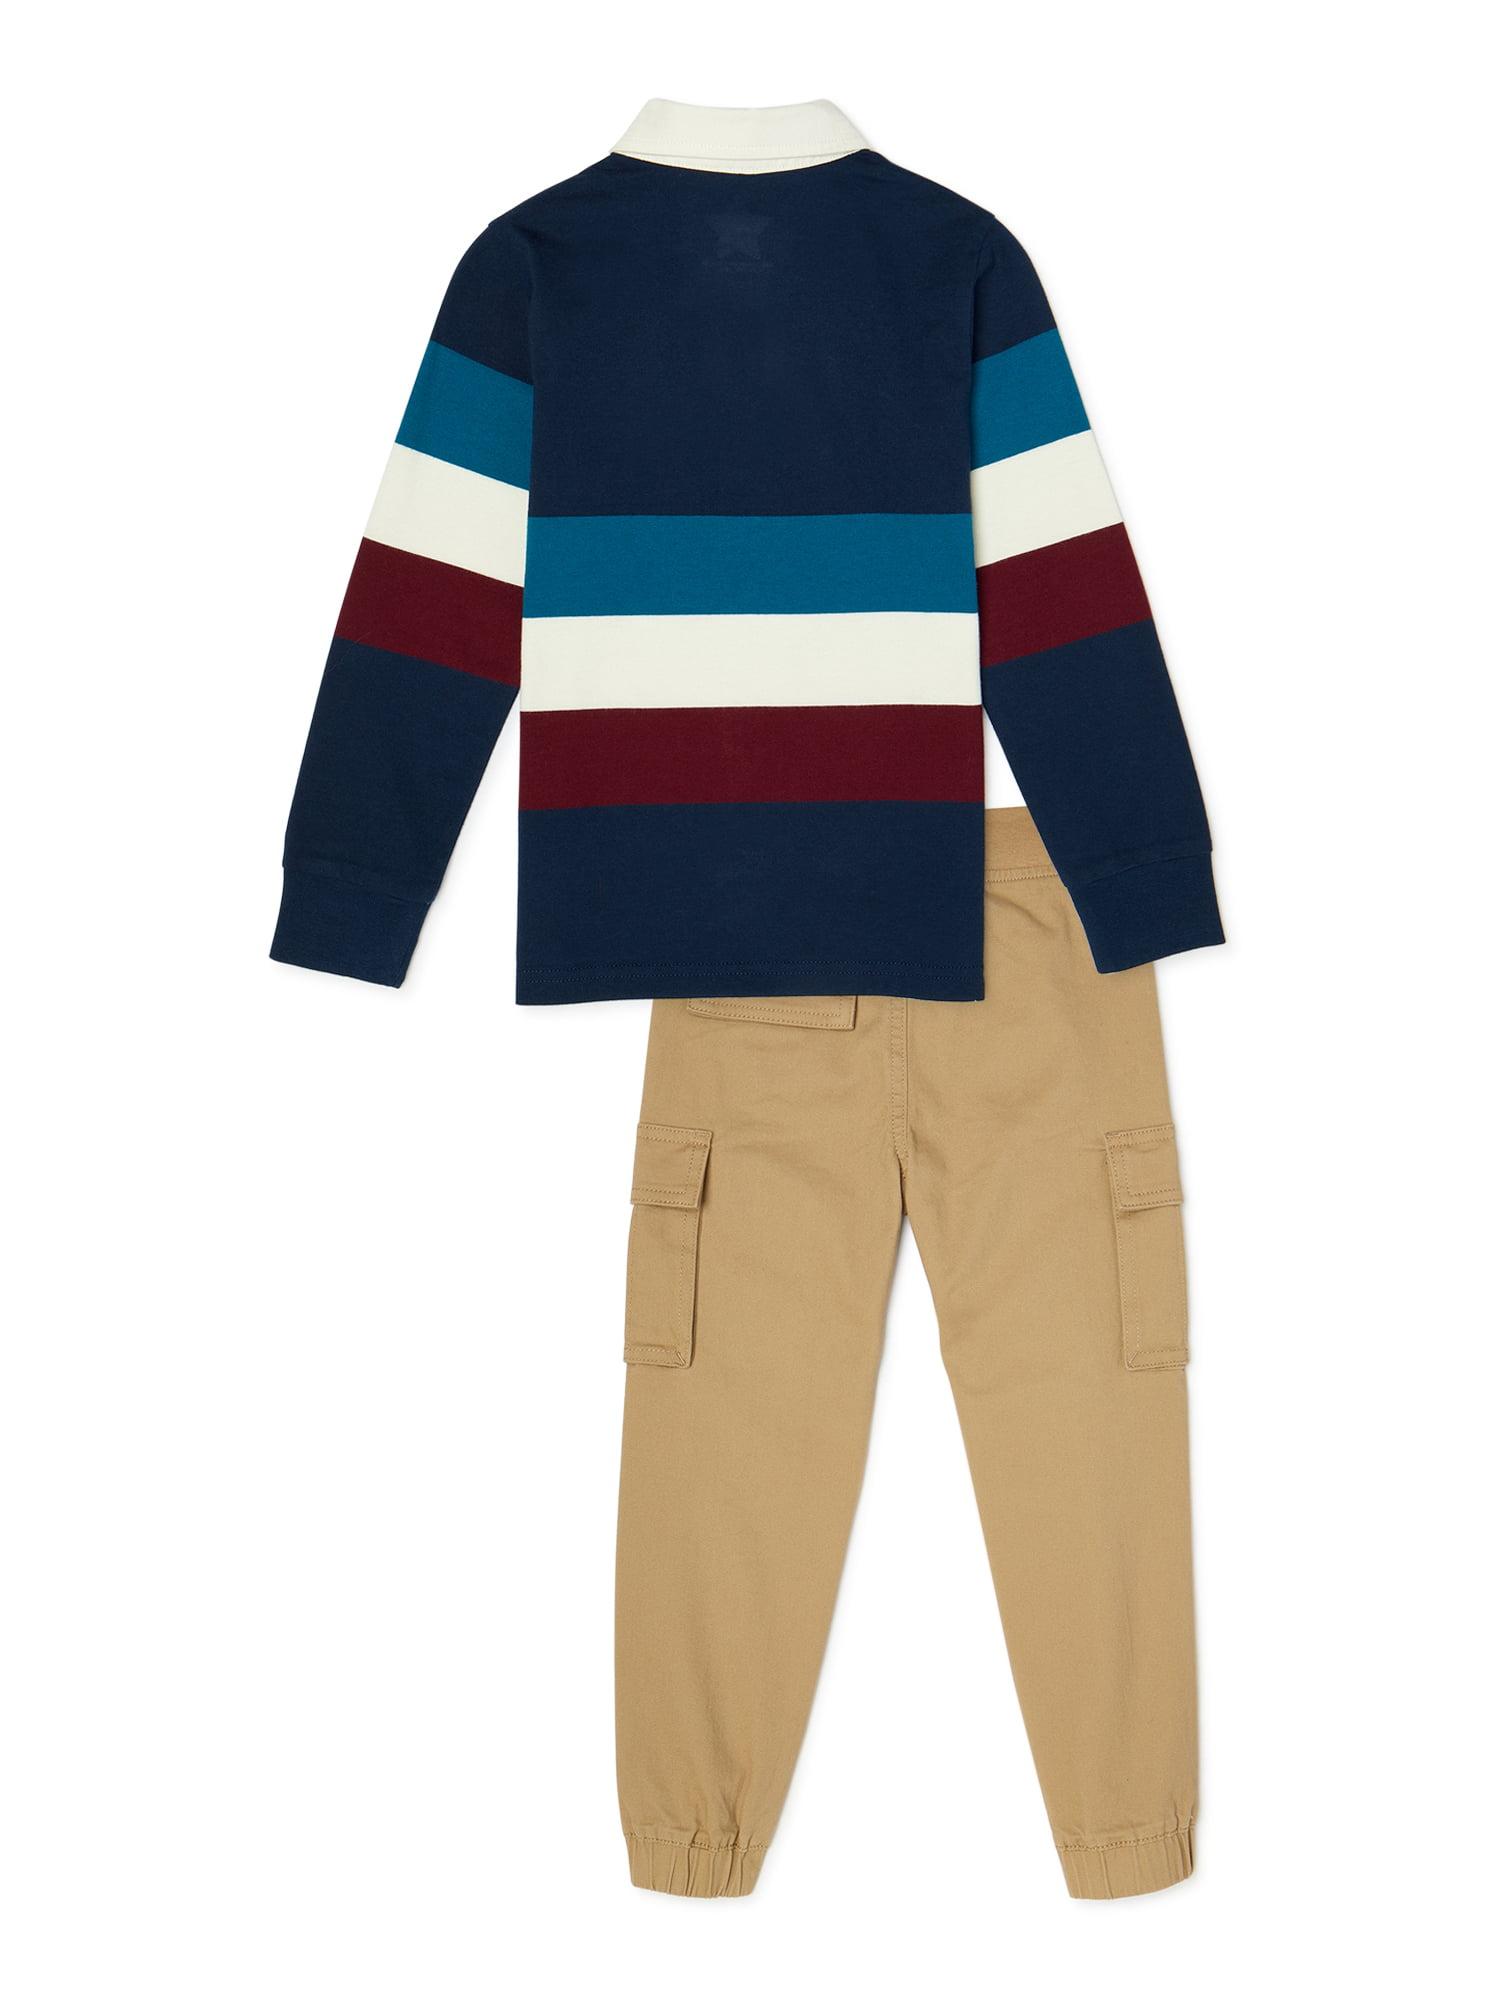 365 Kids From Garanimals 365 Kids From Garanimals Boys Striped Rugby Polo Shirt Cargo Jogger Pants 2 Piece Outfit Set Sizes 4 10 Walmart Com Walmart Com